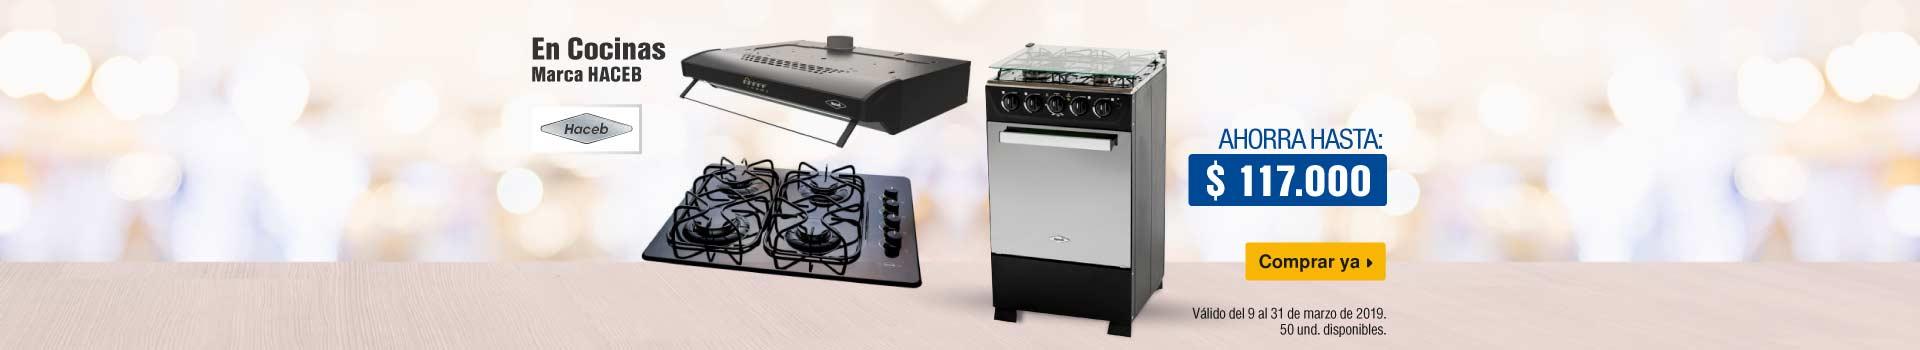 AK-KT-mayores-2-ELECT-BCAT-cocina-HACEB-060319